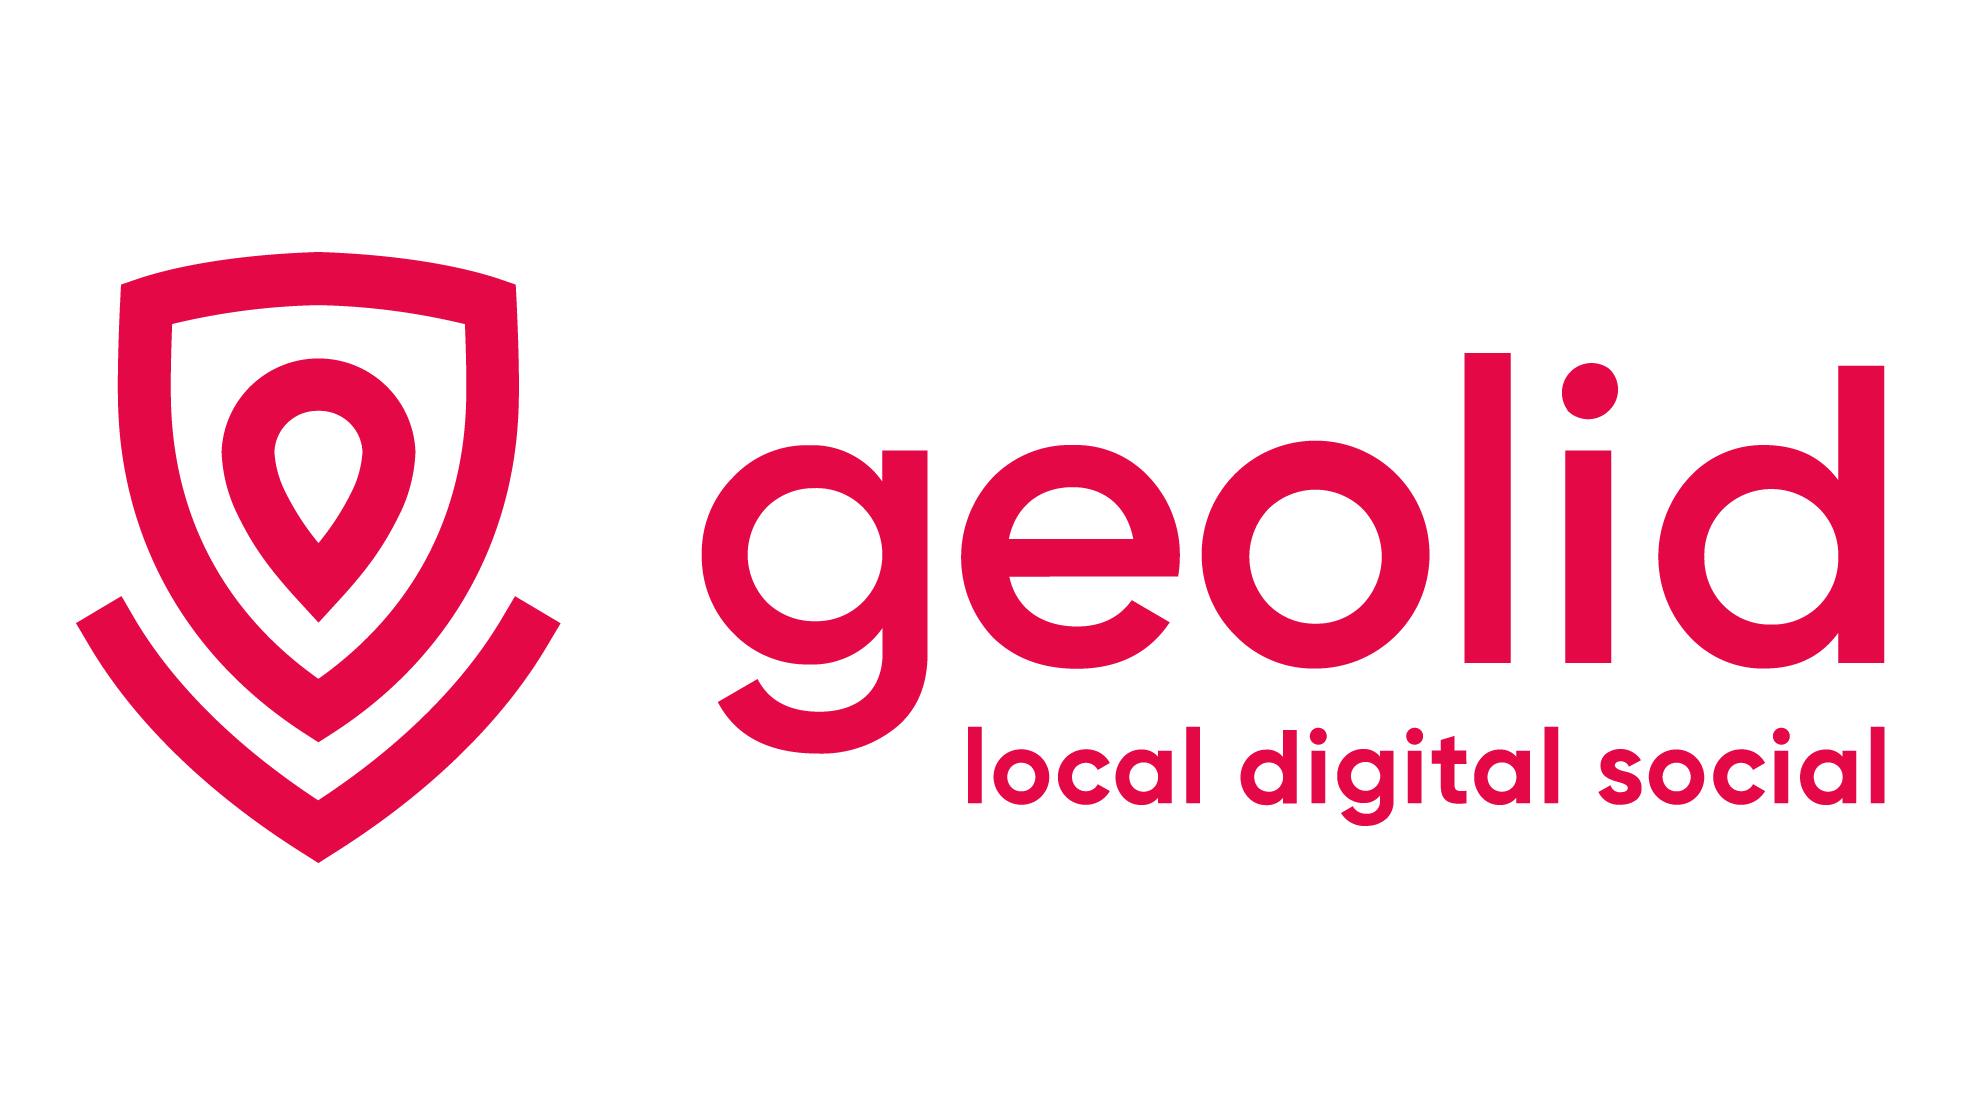 Local Digital Social Geolid Logo.png